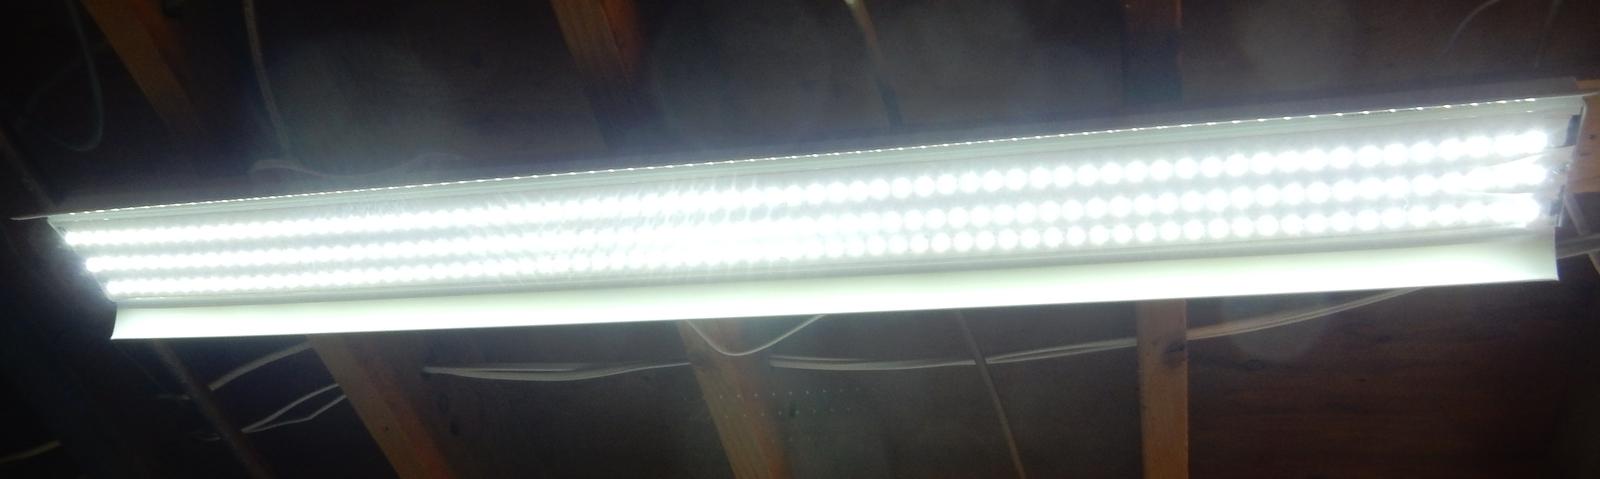 Kit: 100W Power Supply+ 3x 4' LED Strips, Bright White, Hi-lumen